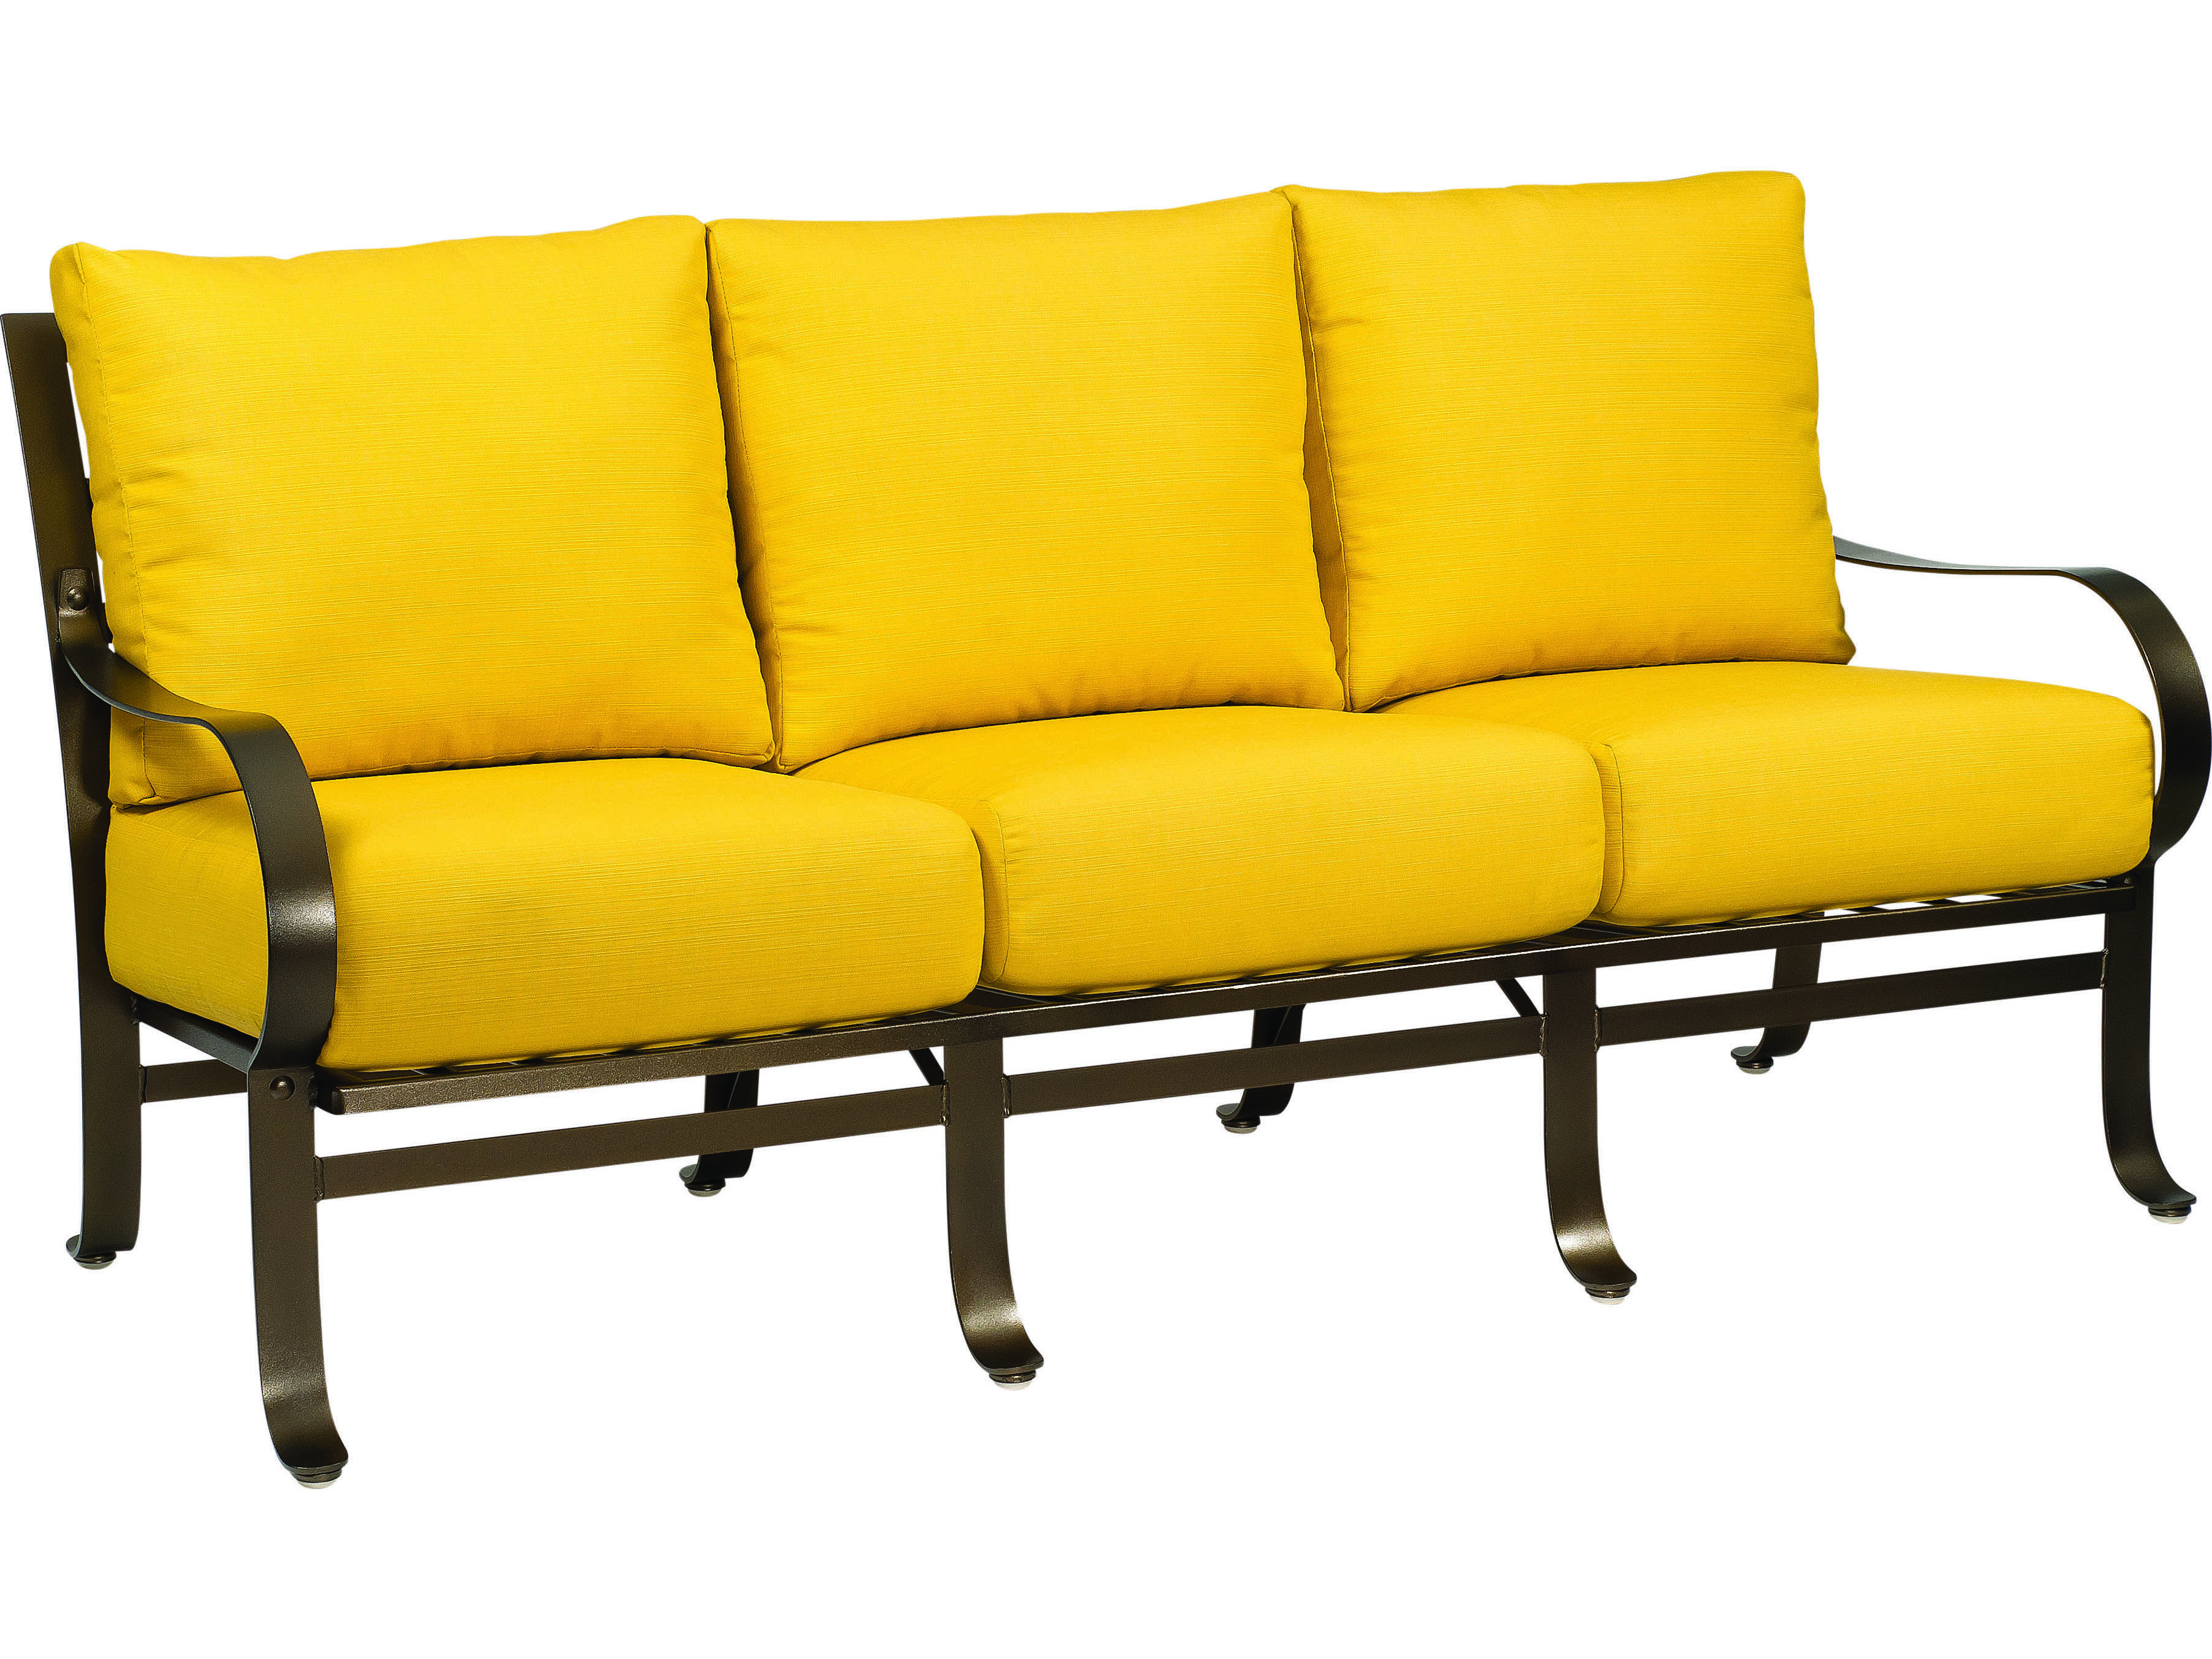 Woodard Cascade Wrought Iron Sofa 2w0020